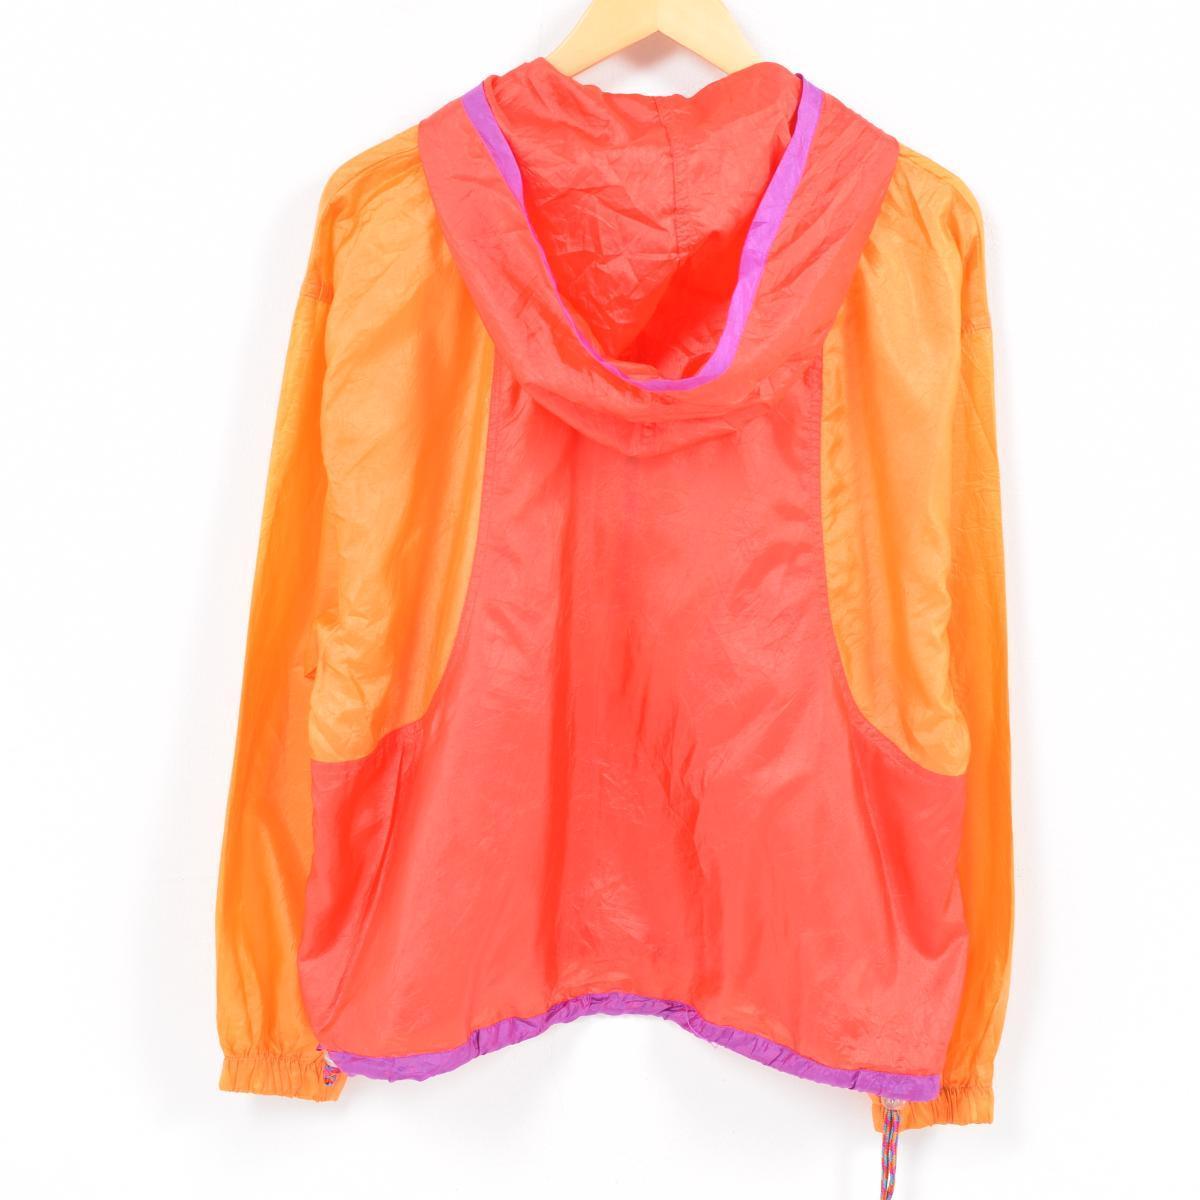 6146820ba82c VINTAGE CLOTHING JAM  90s Nike NIKE ELITE elite half zip nylon parka ...